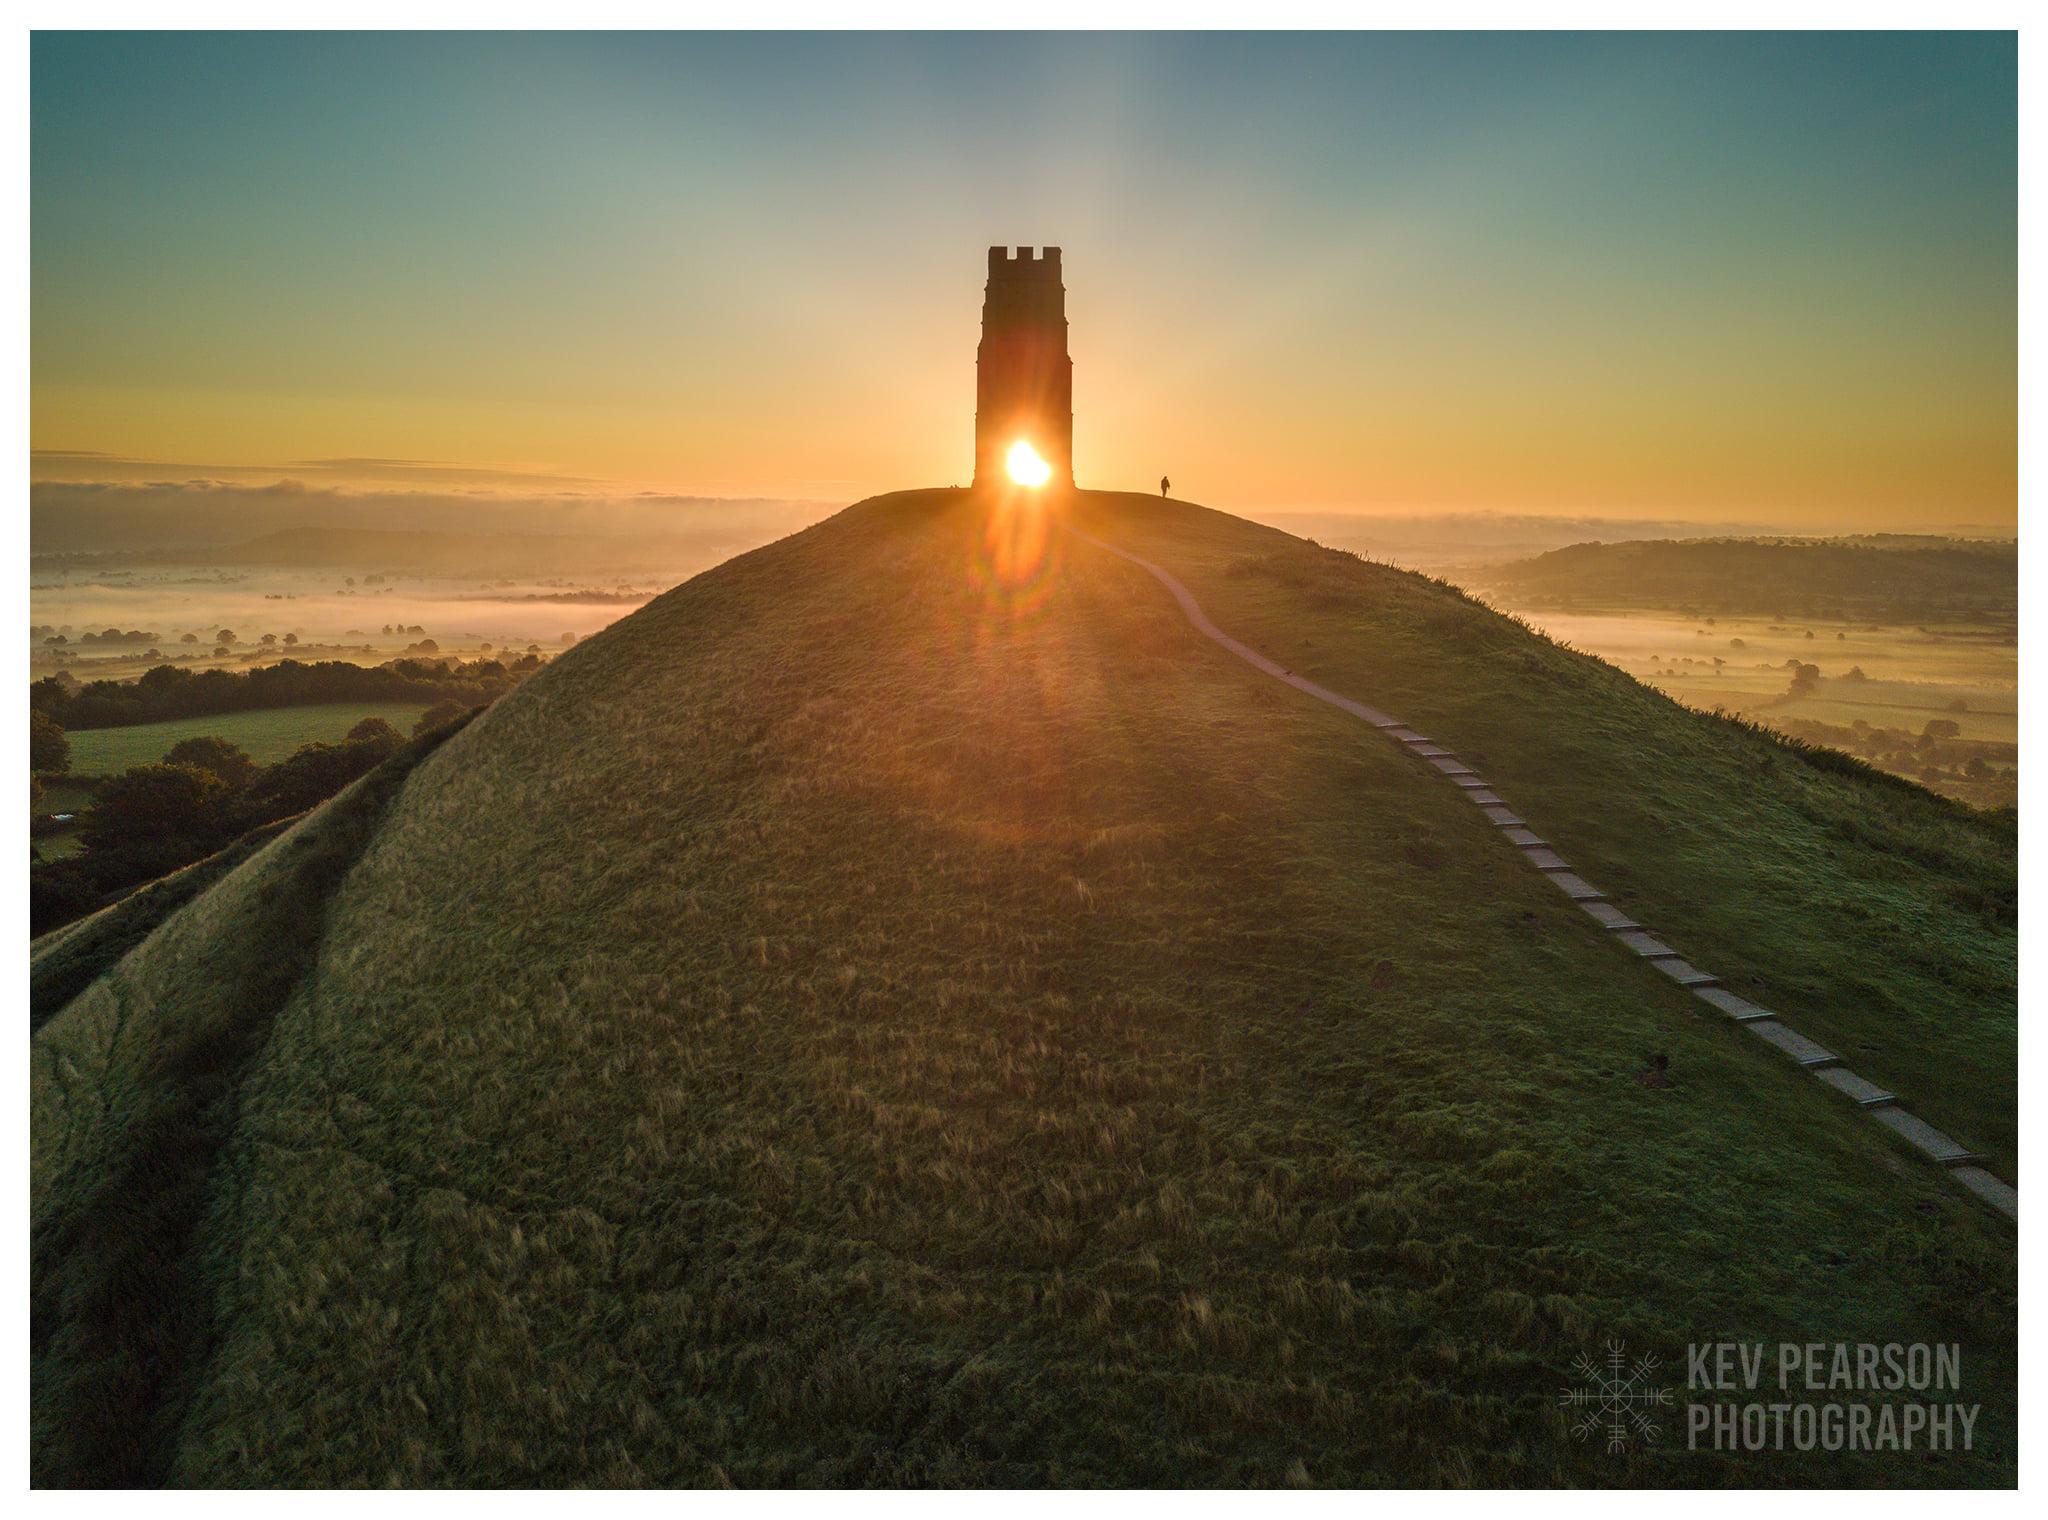 Kev Pearson Photography De Tor in Glastonbury. Vandaag!